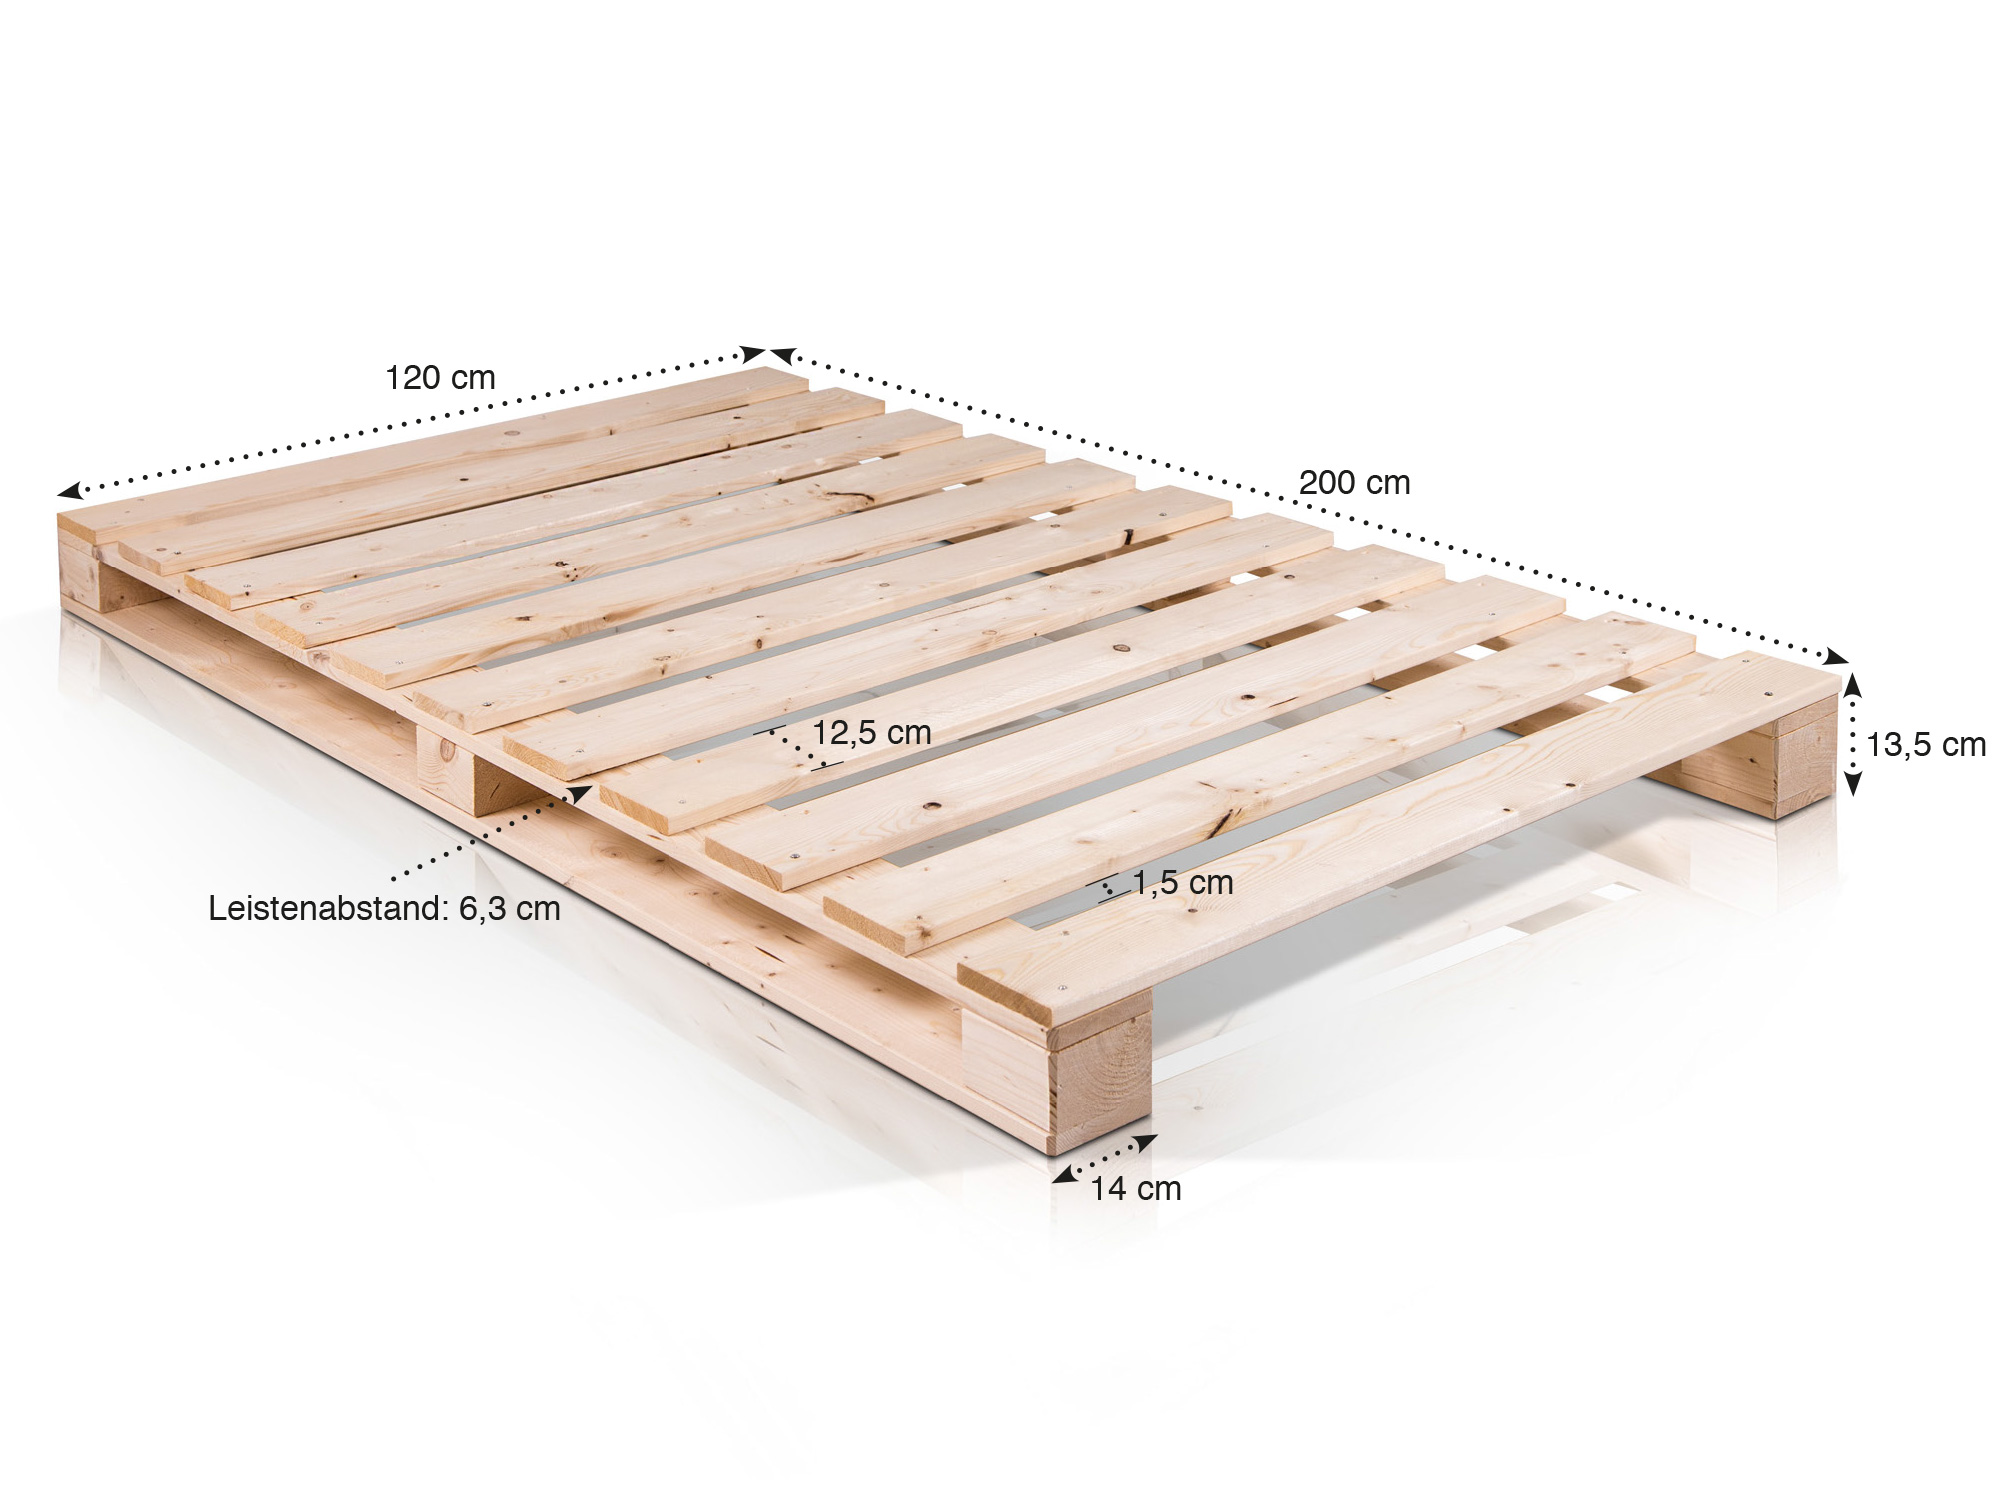 paletti massivholzbett aus paletten 120 x 200 cm fichte. Black Bedroom Furniture Sets. Home Design Ideas